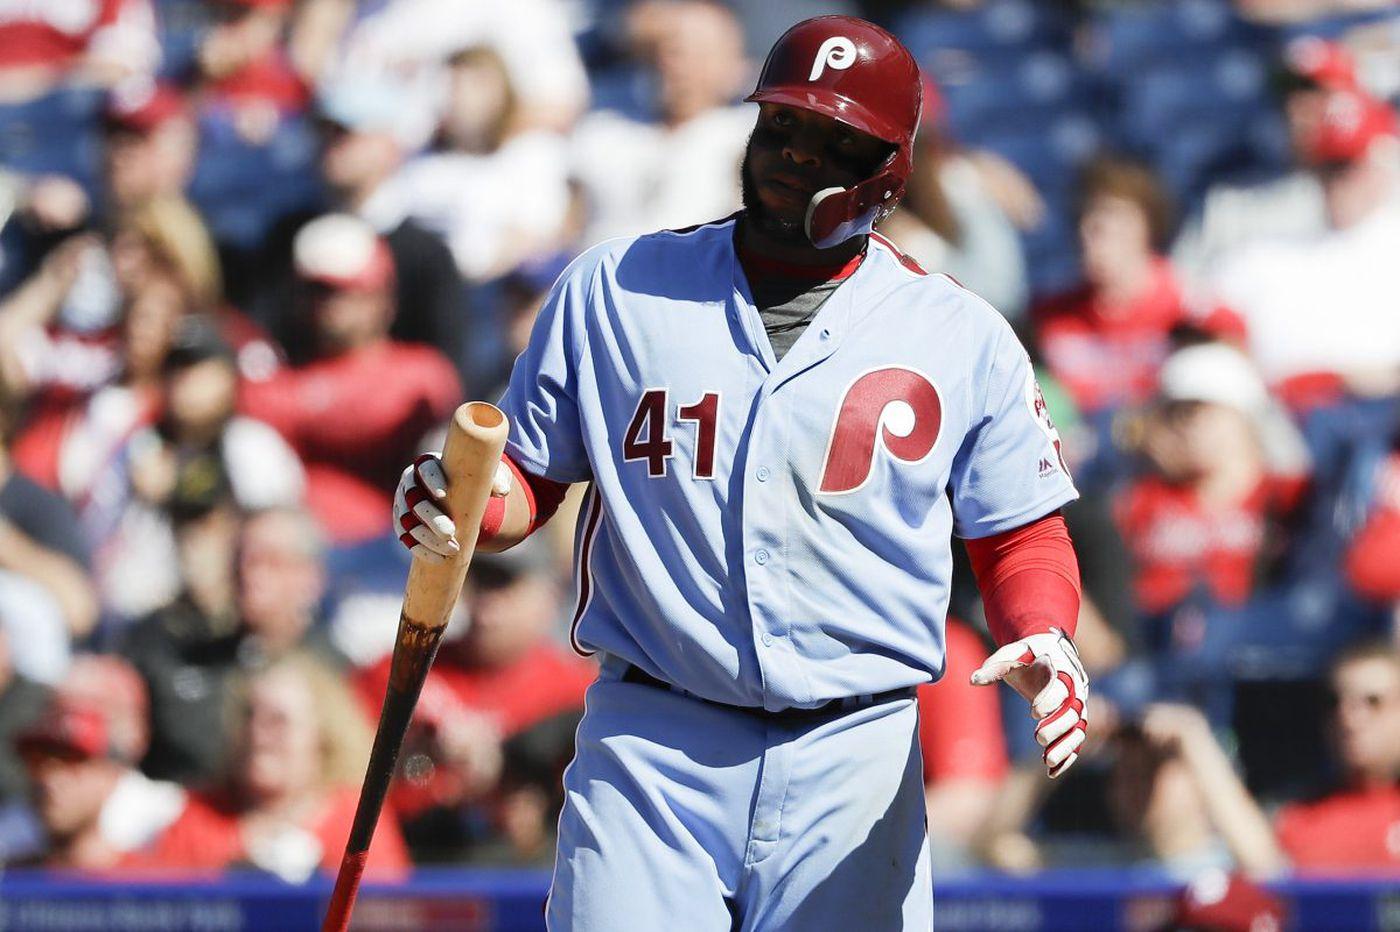 Phillies' Carlos Santana trying to break his funk like Aaron Altherr did